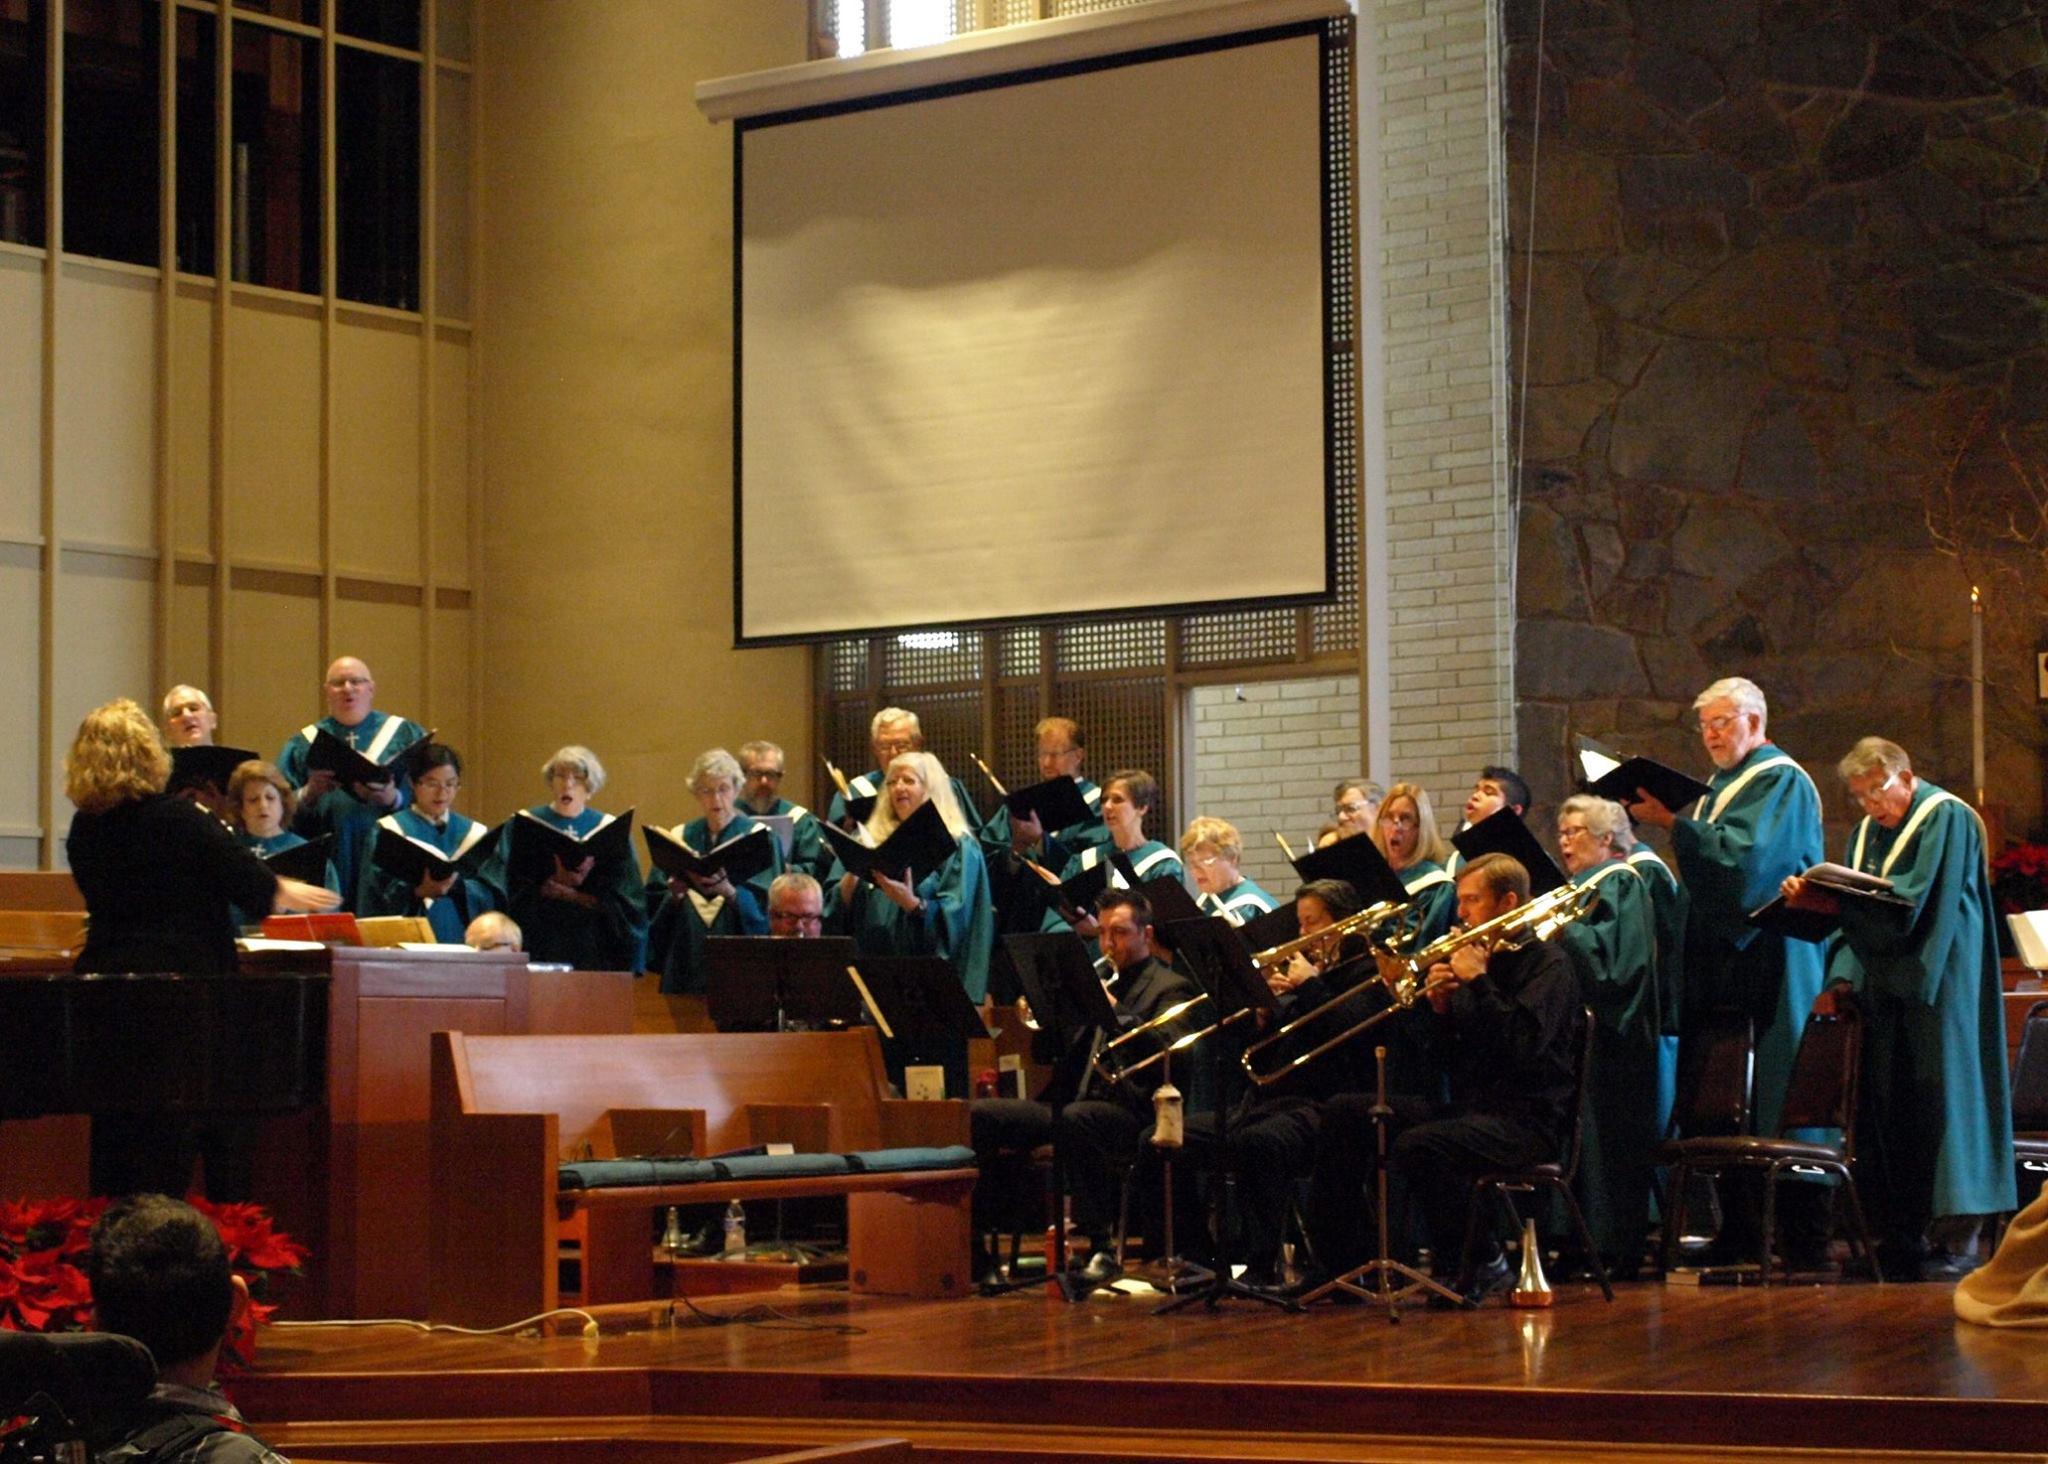 claremont-presbyterian-church-choir-6.jpg